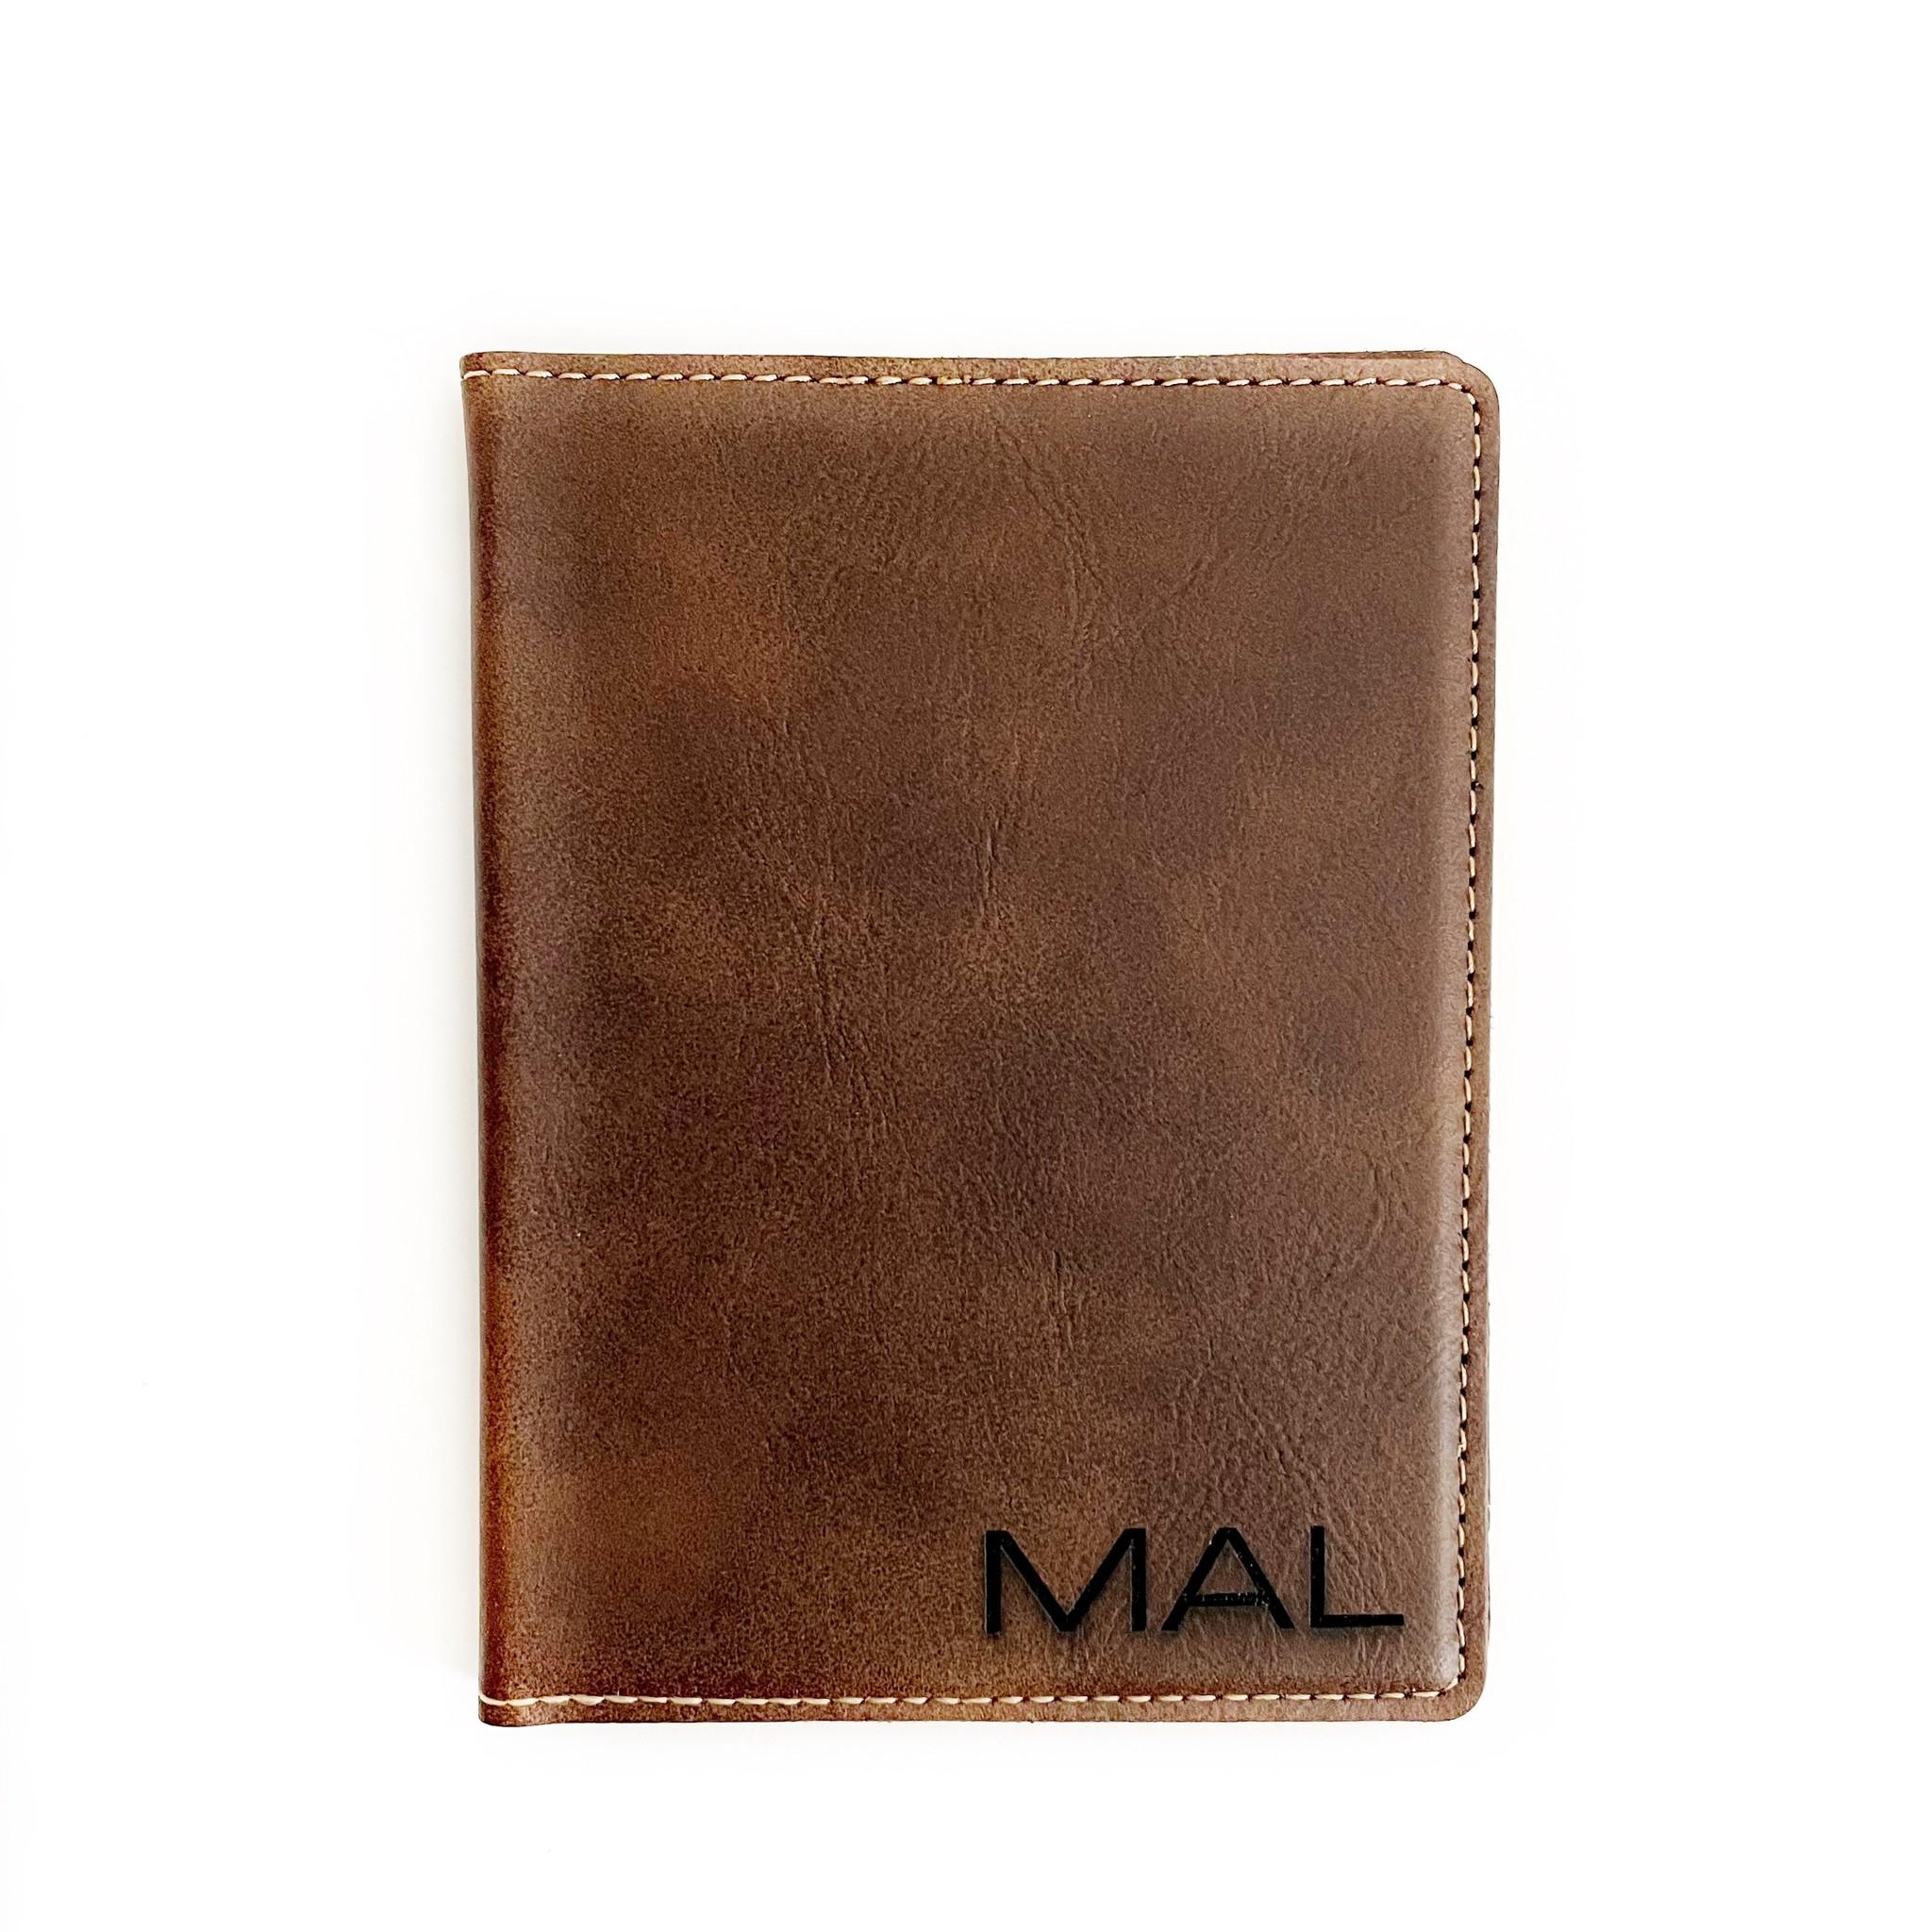 P Graham Dunn Personalized Passport Holder- Brown